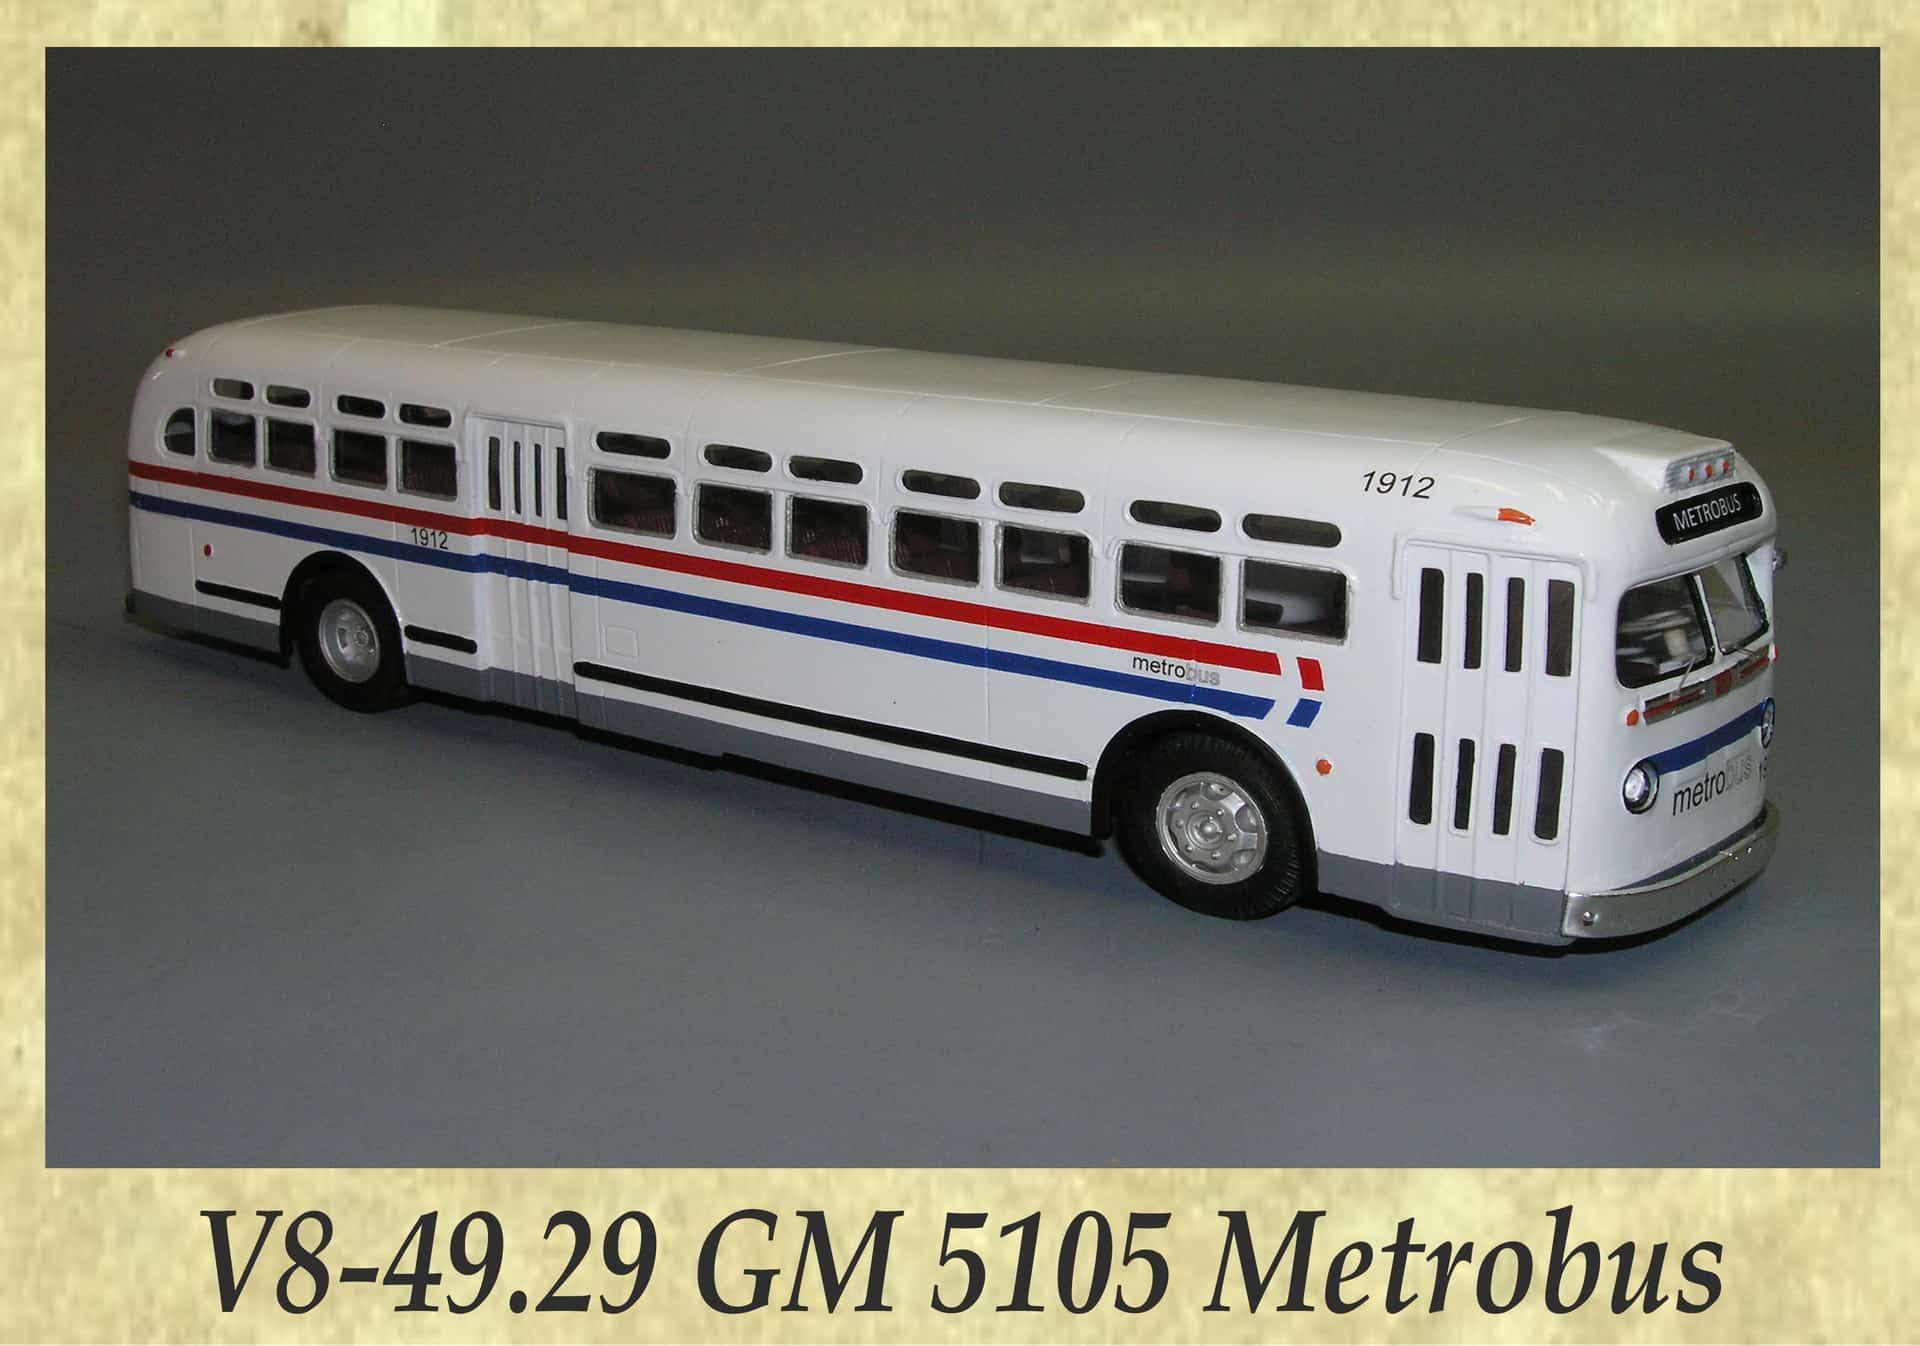 V8-49.29 GM 5105 Metrobus